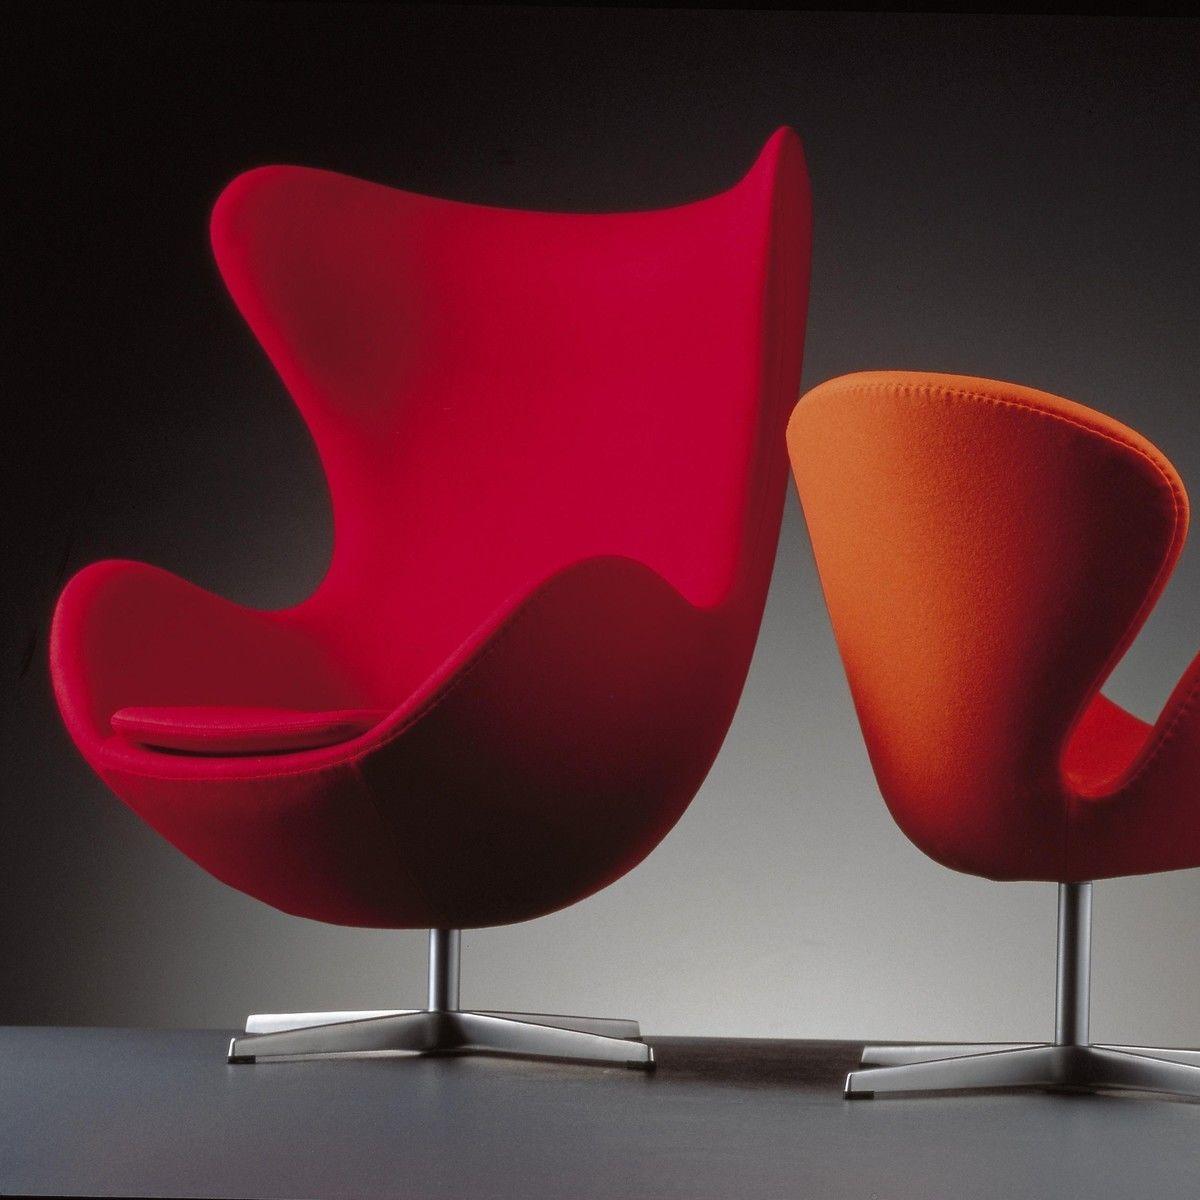 egg chair das ei loungesessel stoff fritz hansen. Black Bedroom Furniture Sets. Home Design Ideas